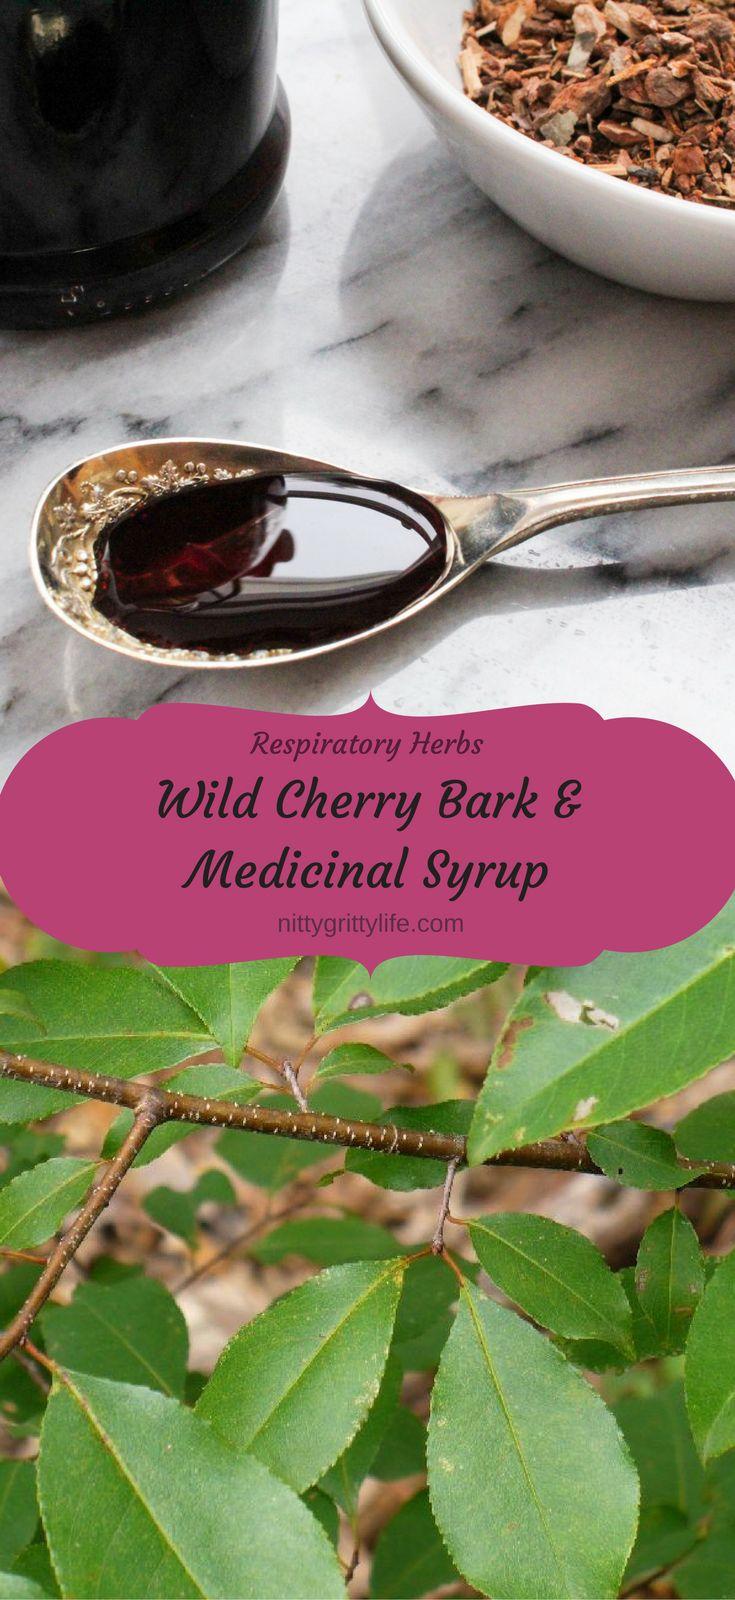 Wild Cherry Bark & Medicinal Syrup